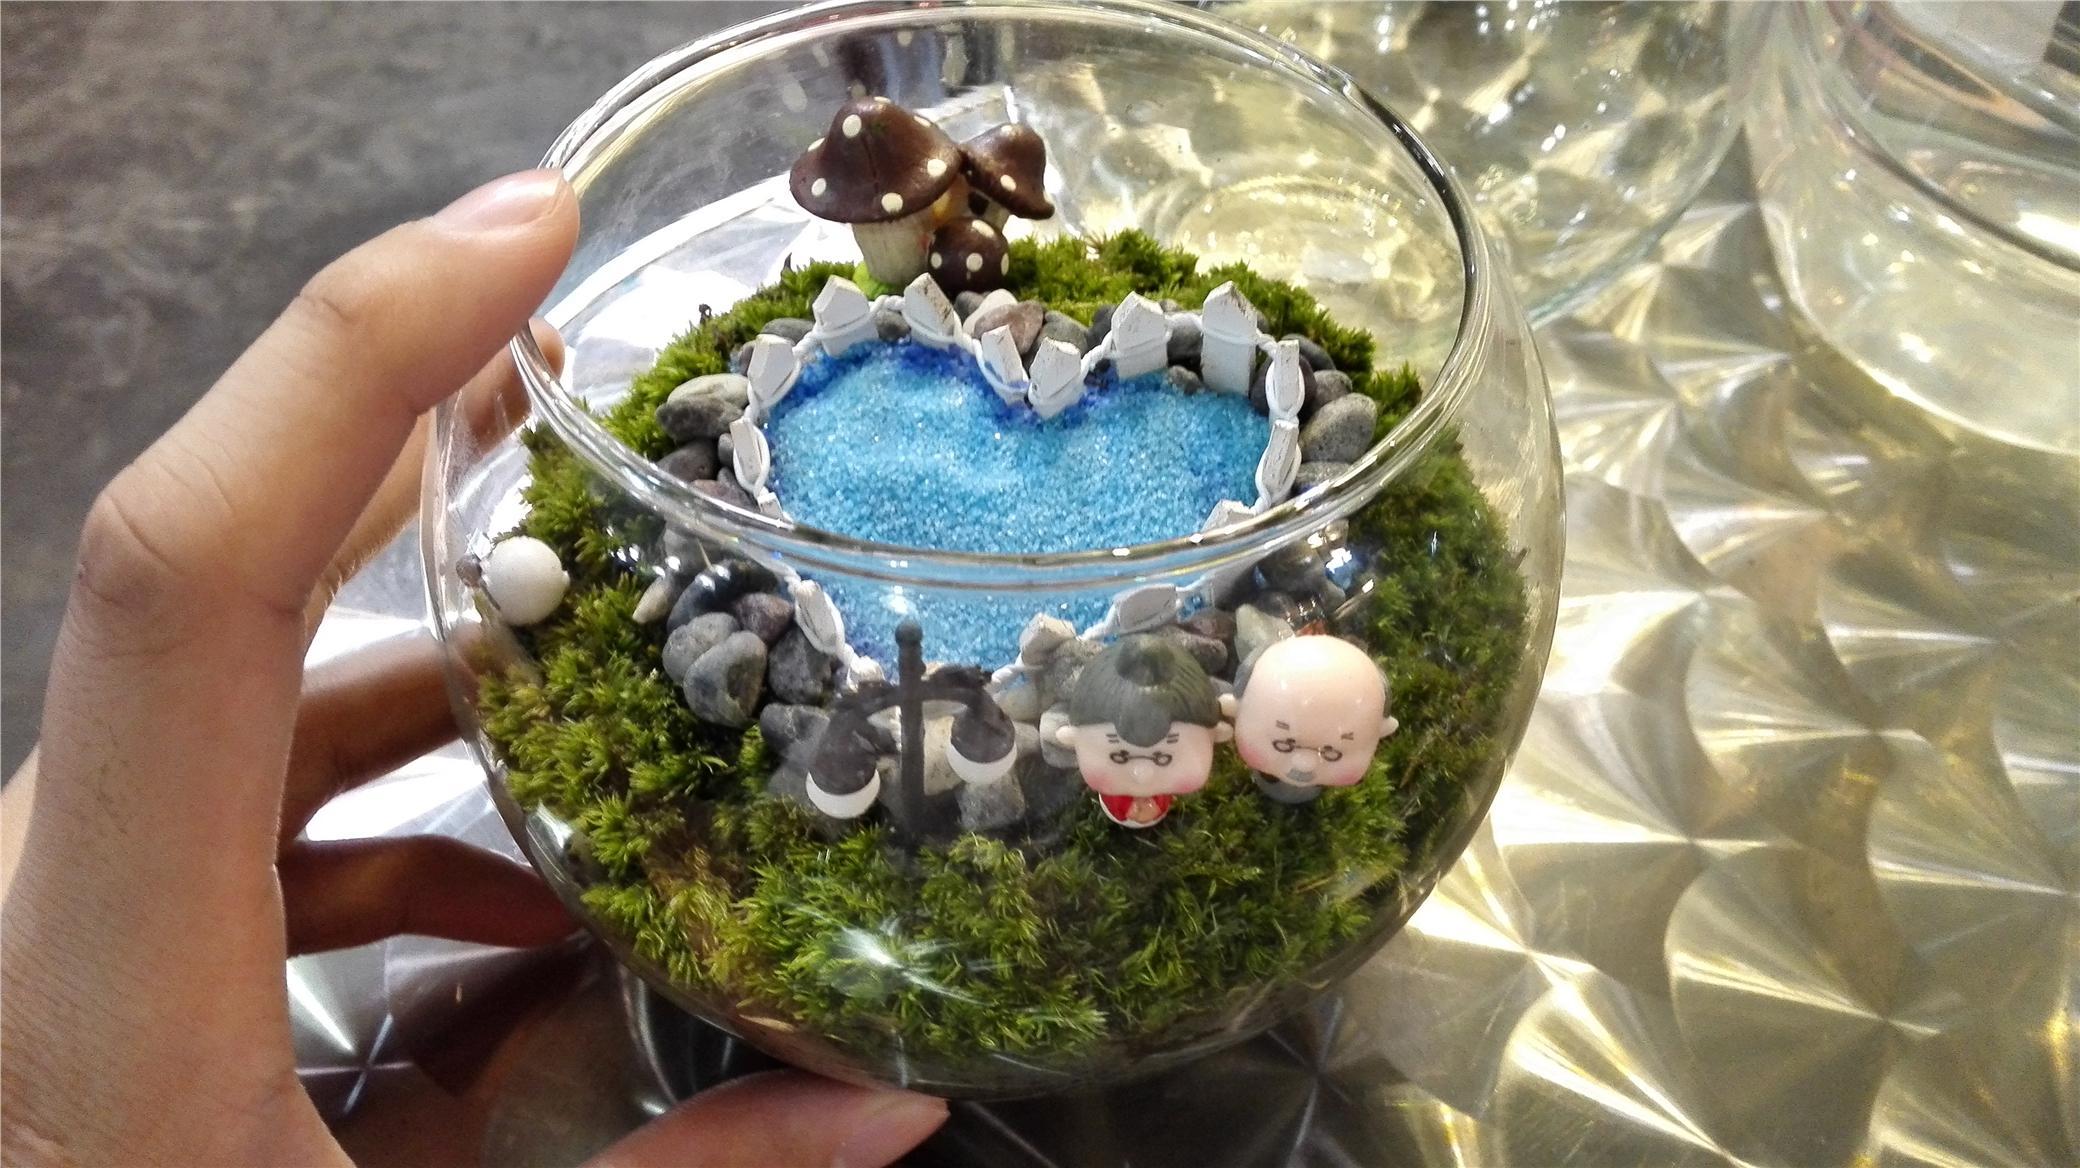 DIY Small Living PlantTerrarium De End PM - Amazing diy non living terrarium